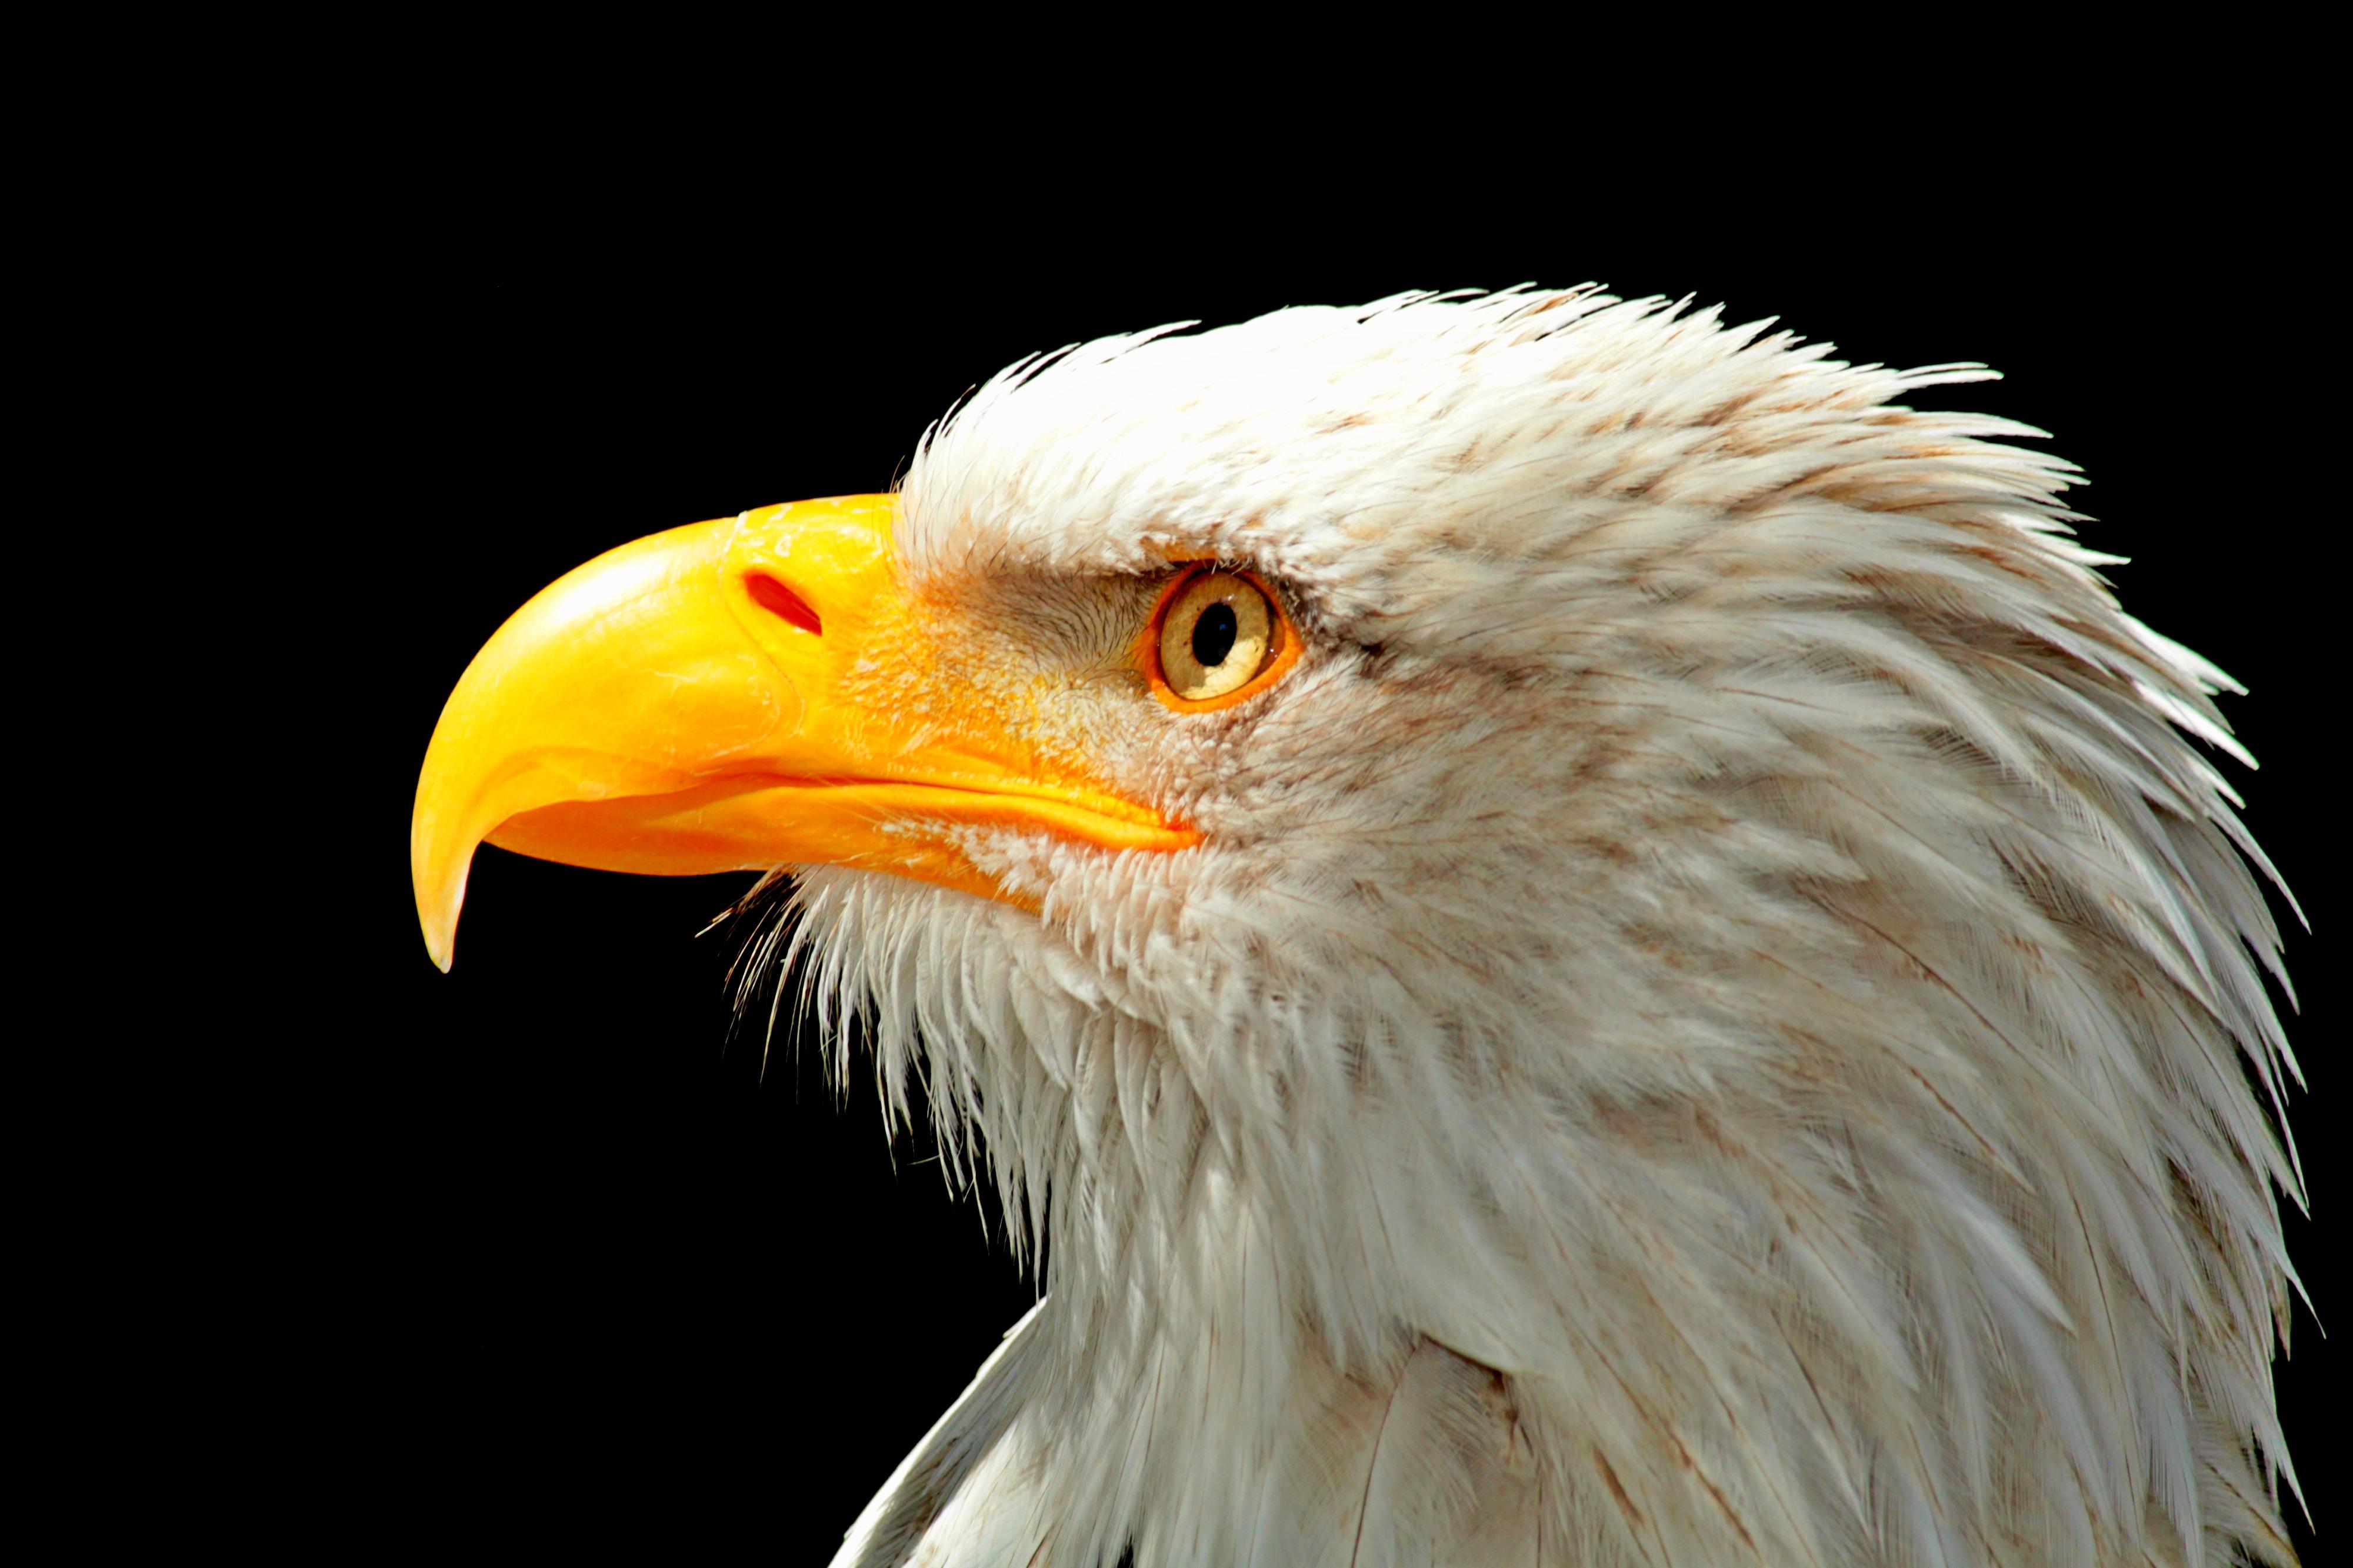 Eagle beak - photo#36